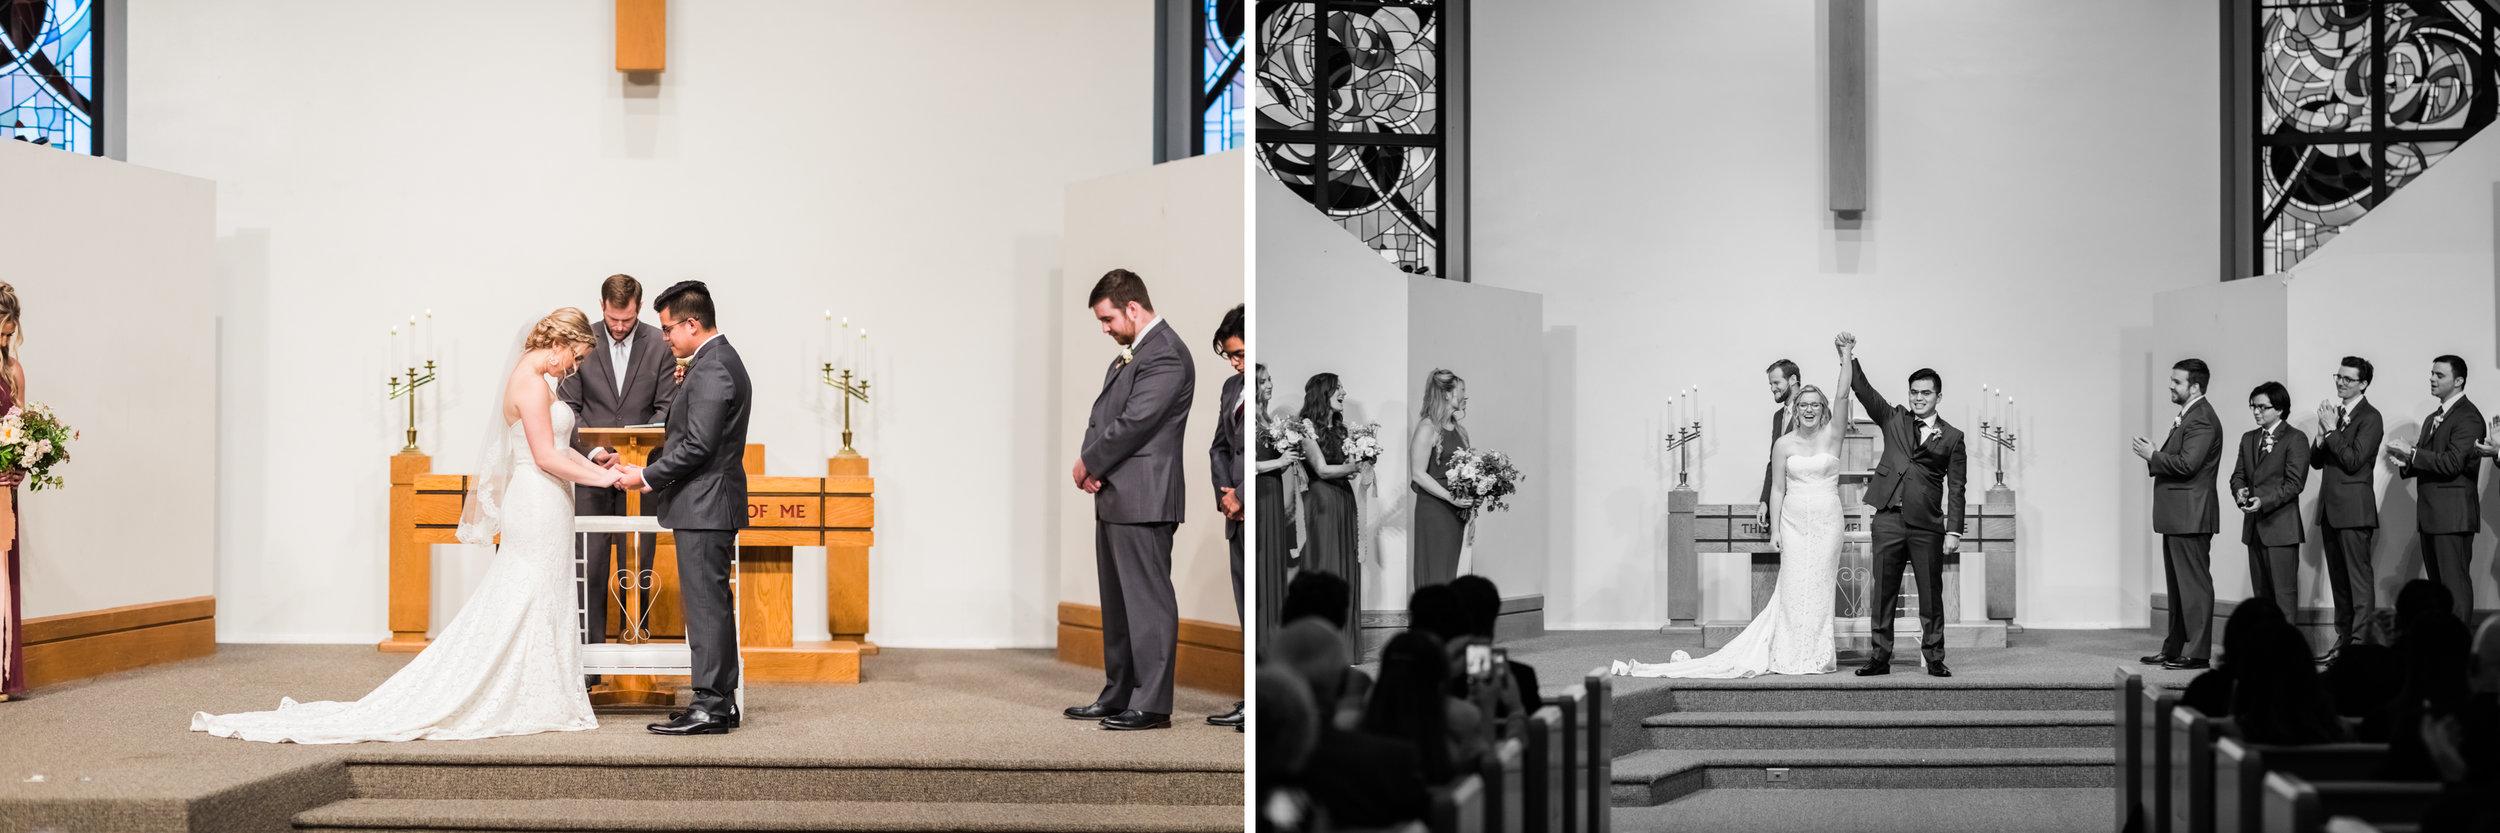 Kansas City Wedding Photographer 50.jpg